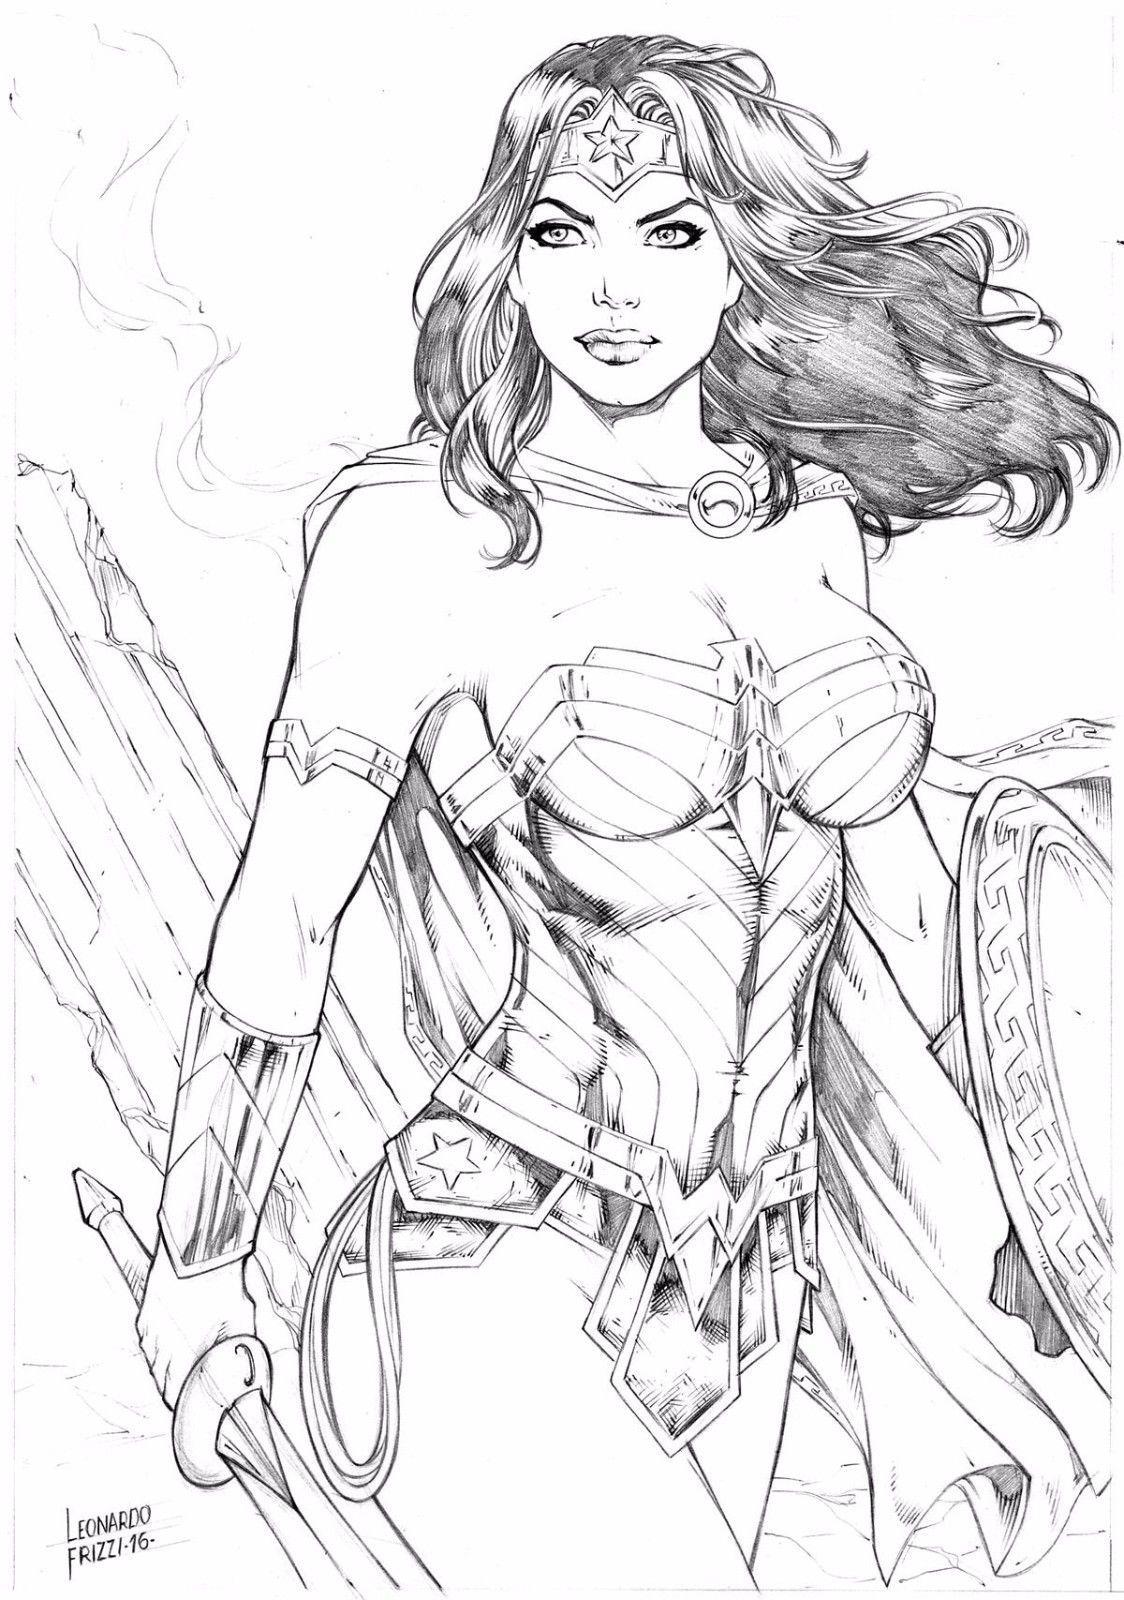 Wonder Woman - Art by Leonardo Frizzi   blanco y negro   Pinterest ...